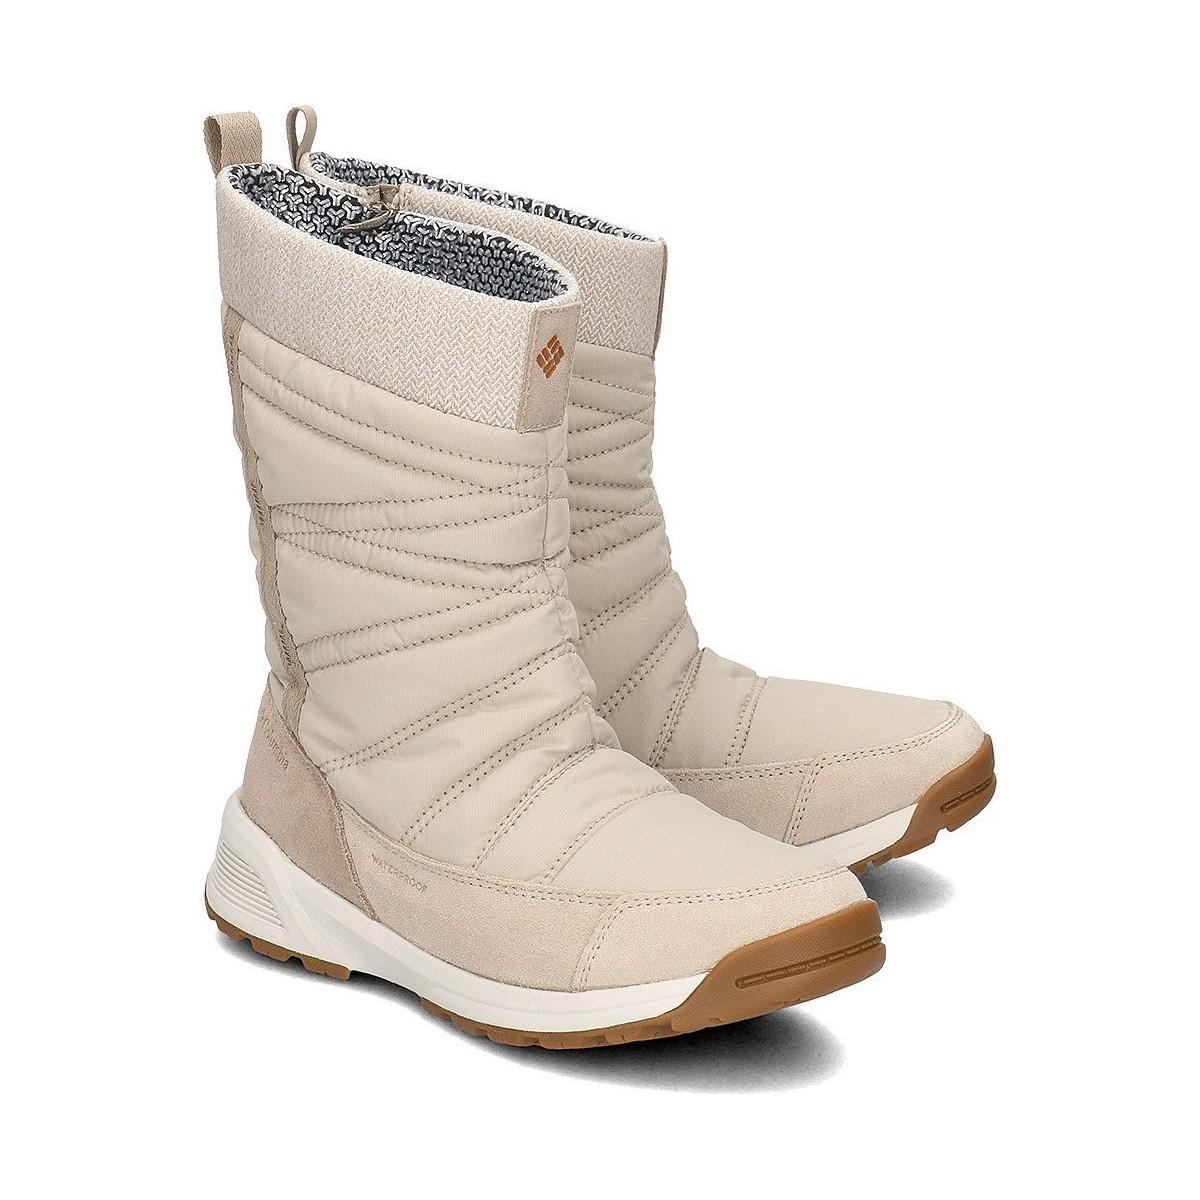 d98f9bd90483 Columbia Meadows Slip On Omni Heat 3d Women's Snow Boots In Beige in ...